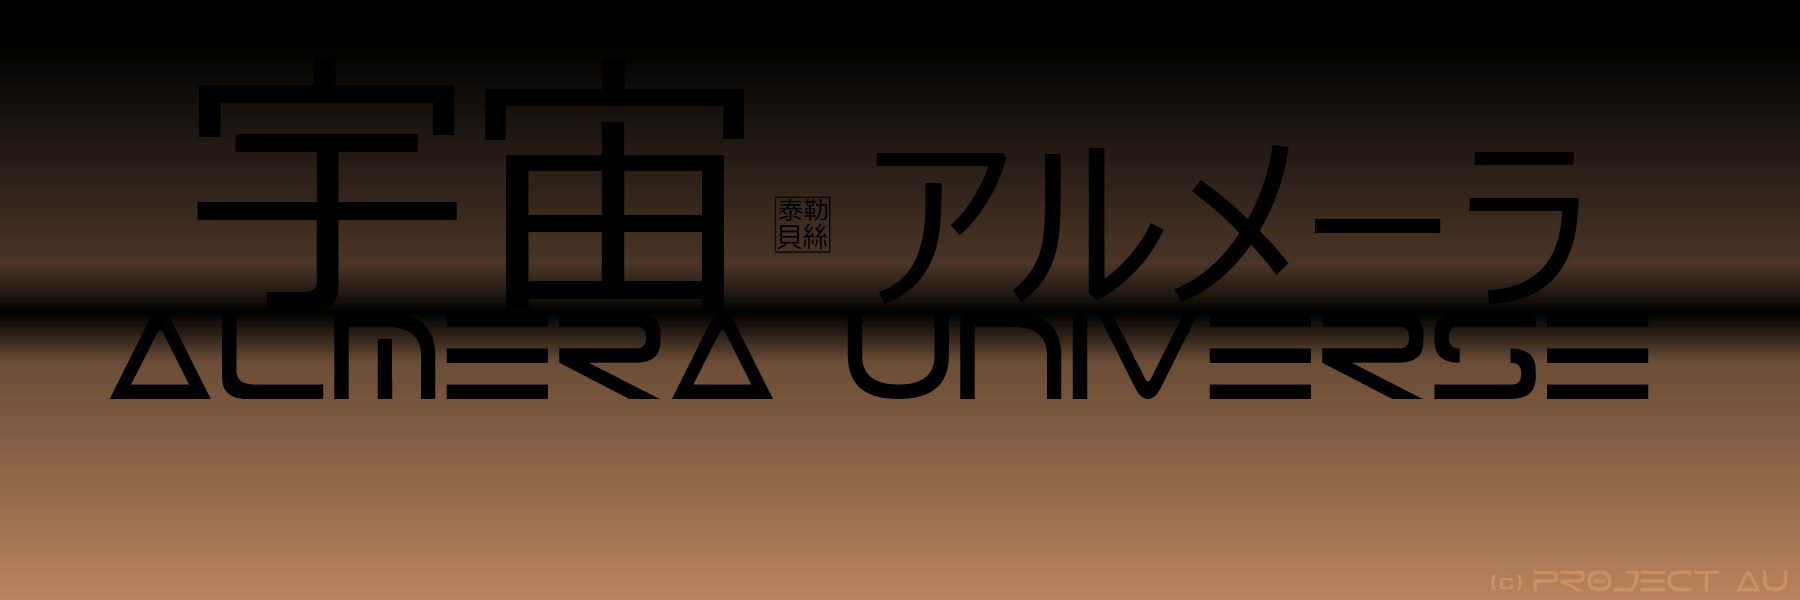 AU Banner Update by Gwentari